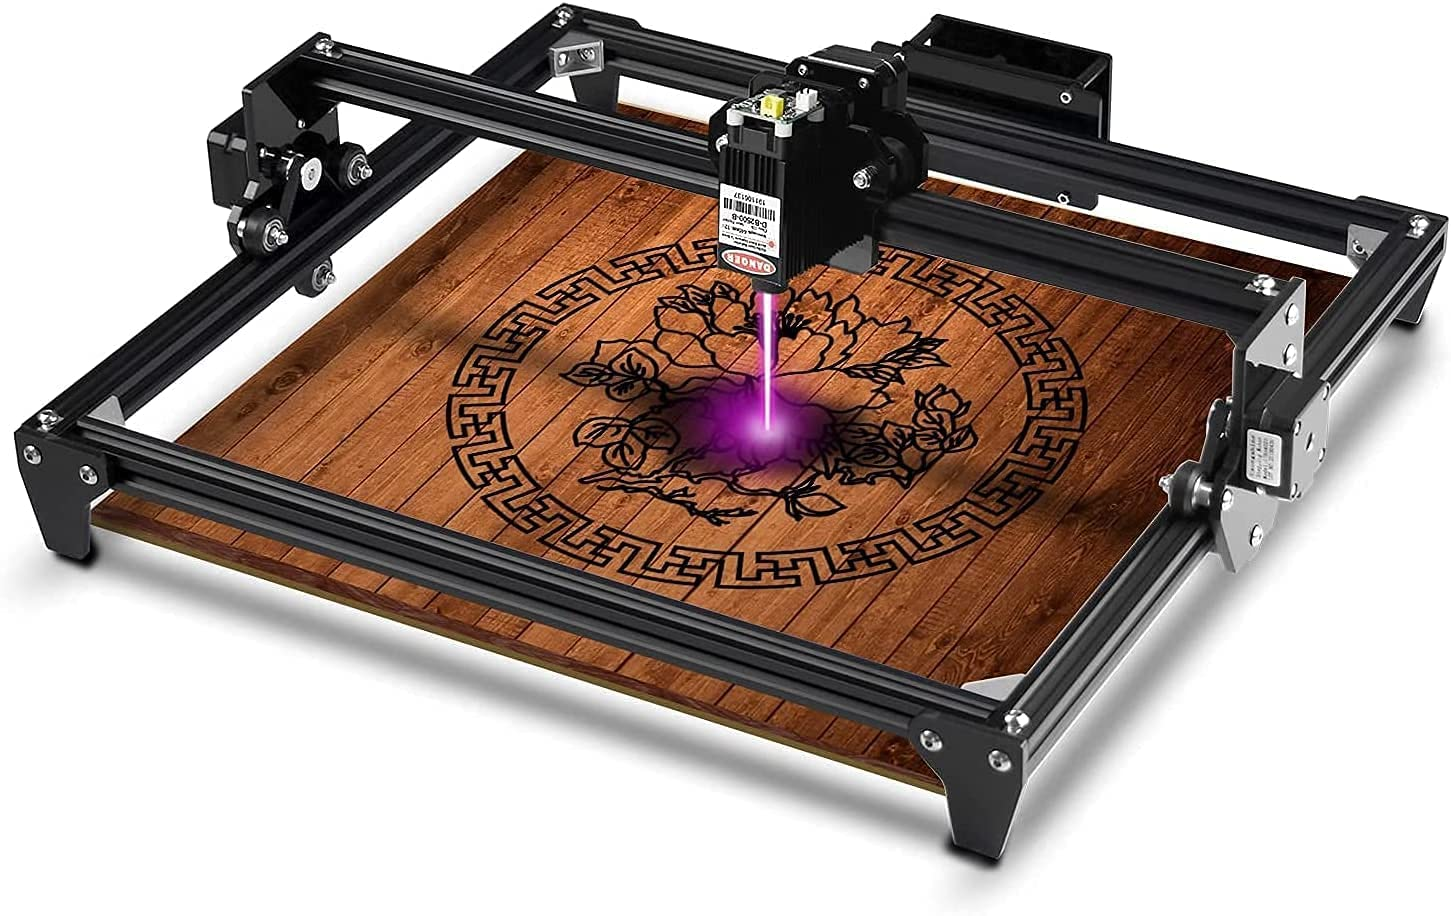 Twotrees Totem Laser Engraver CNC